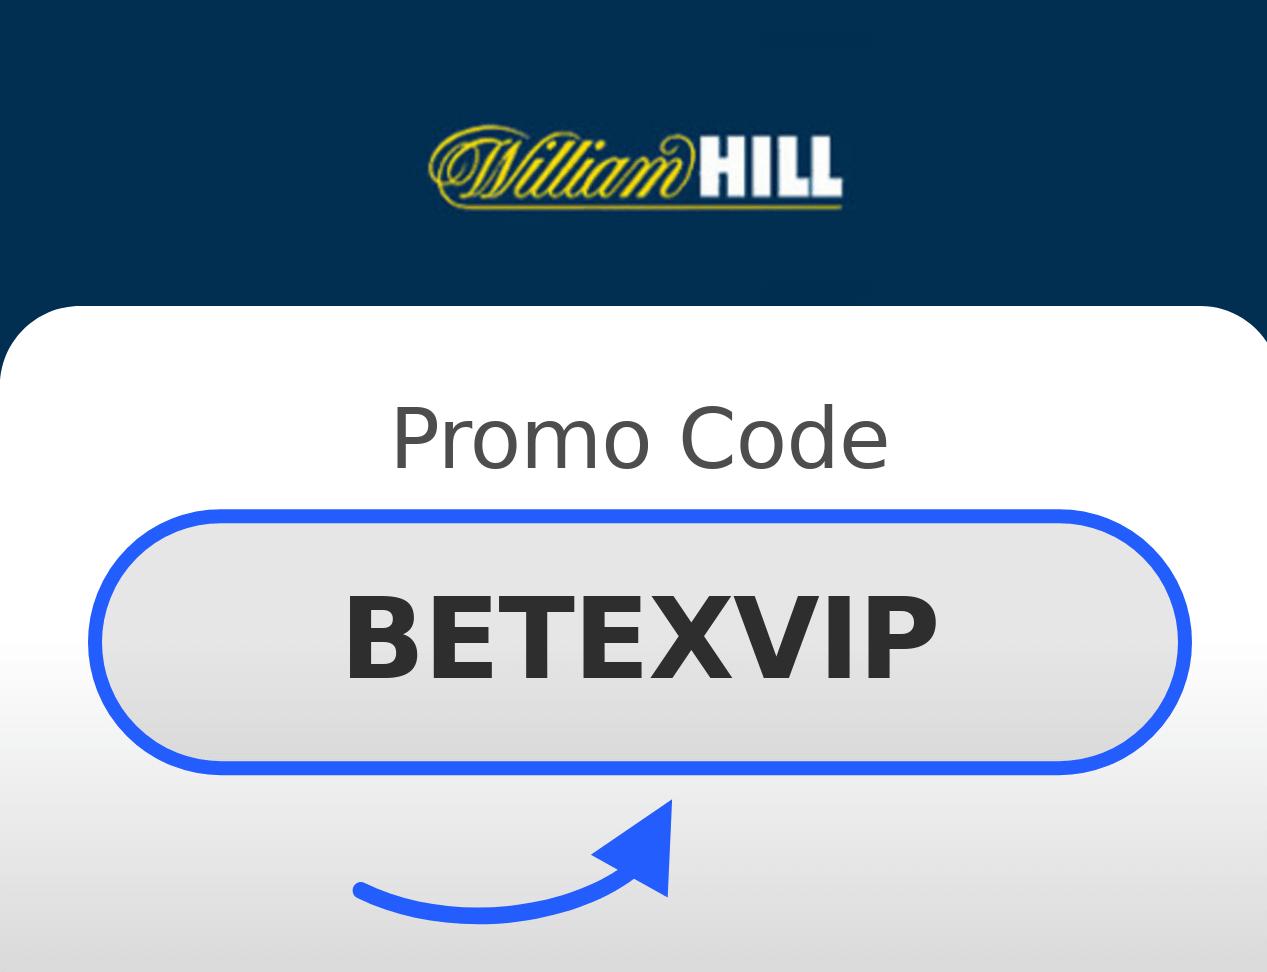 William Hill Promo Code